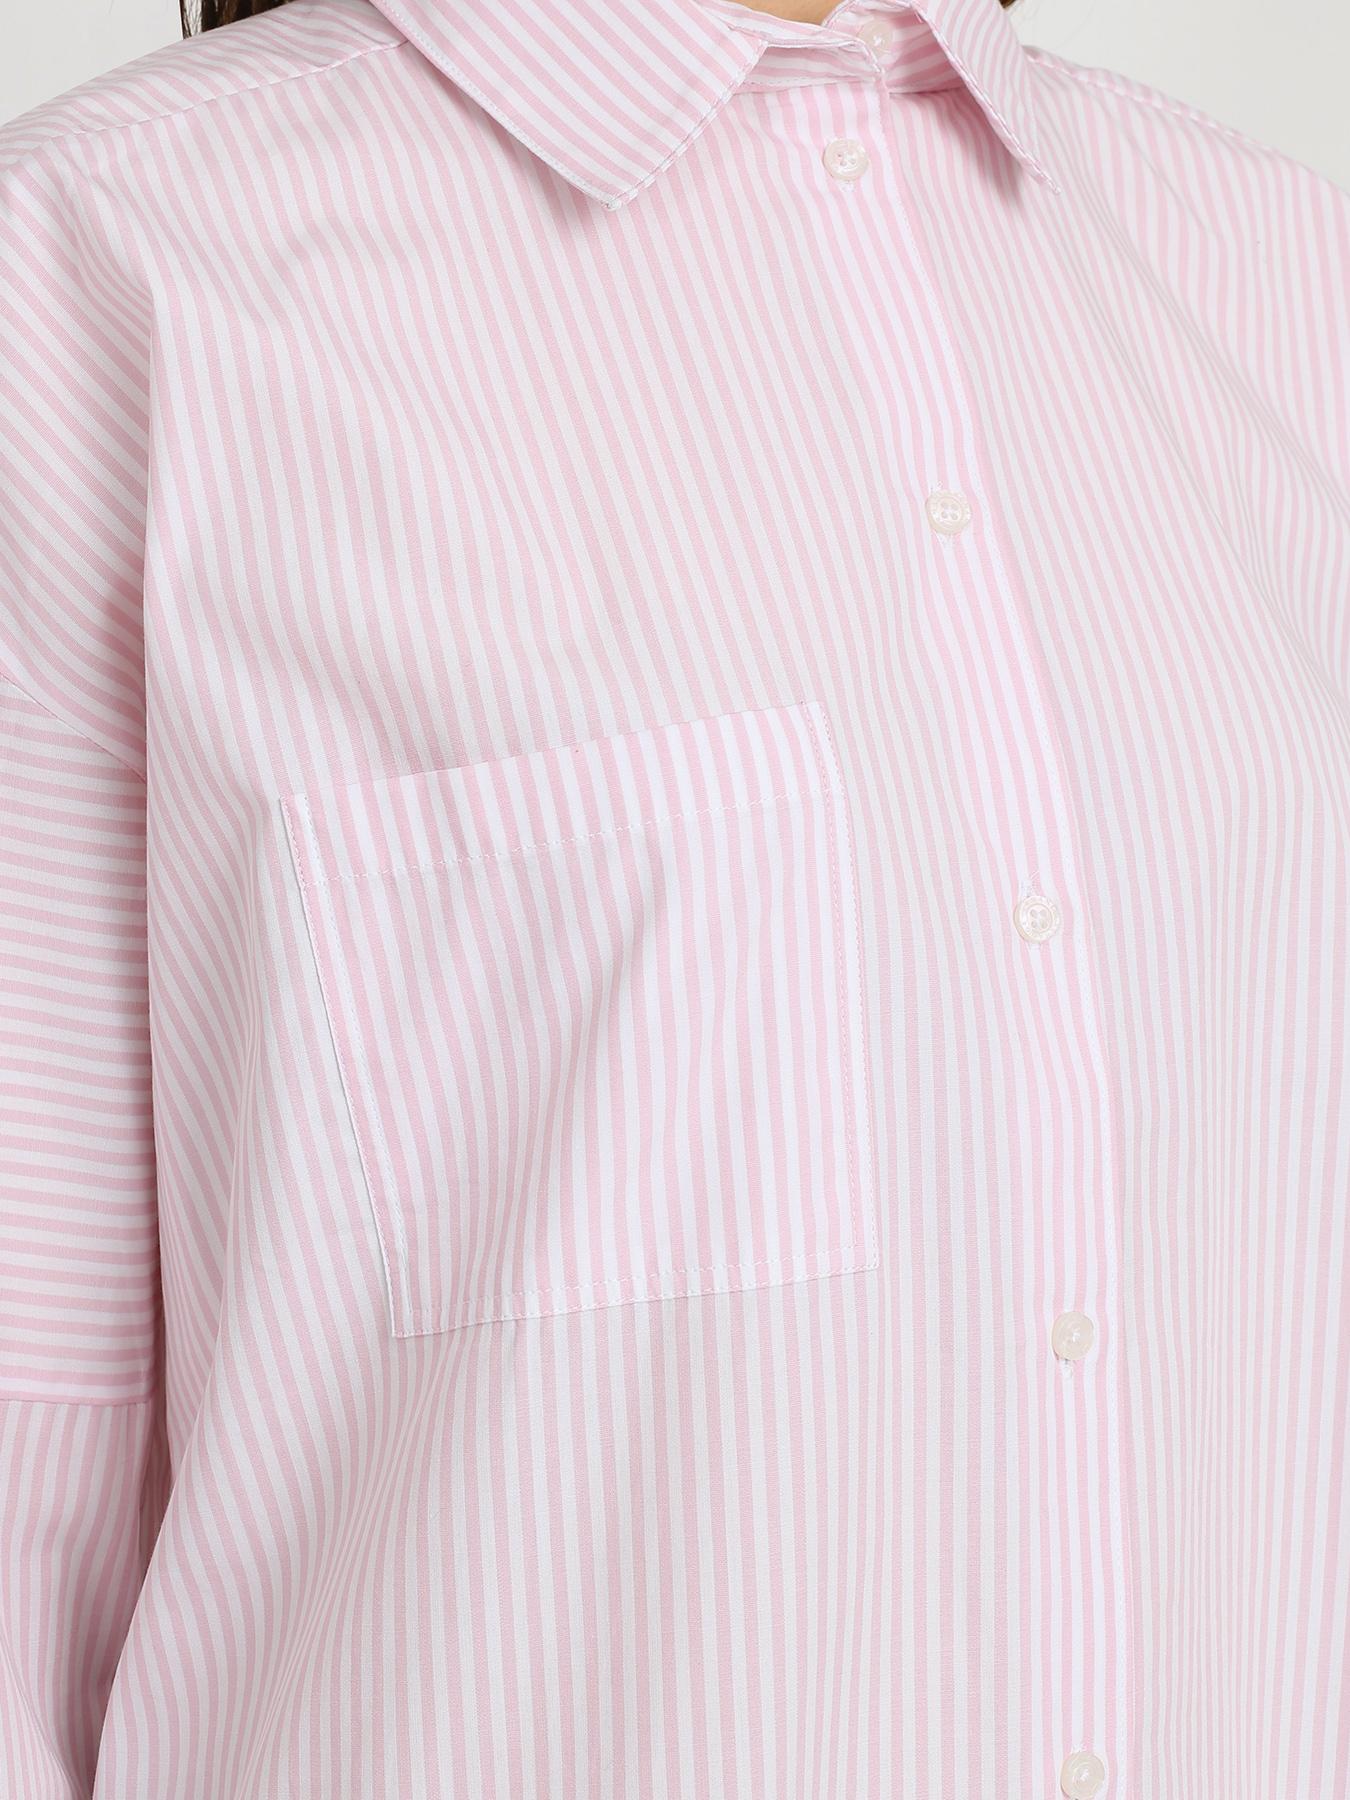 Armani Exchange Полосатая рубашка 342005-044 Фото 3